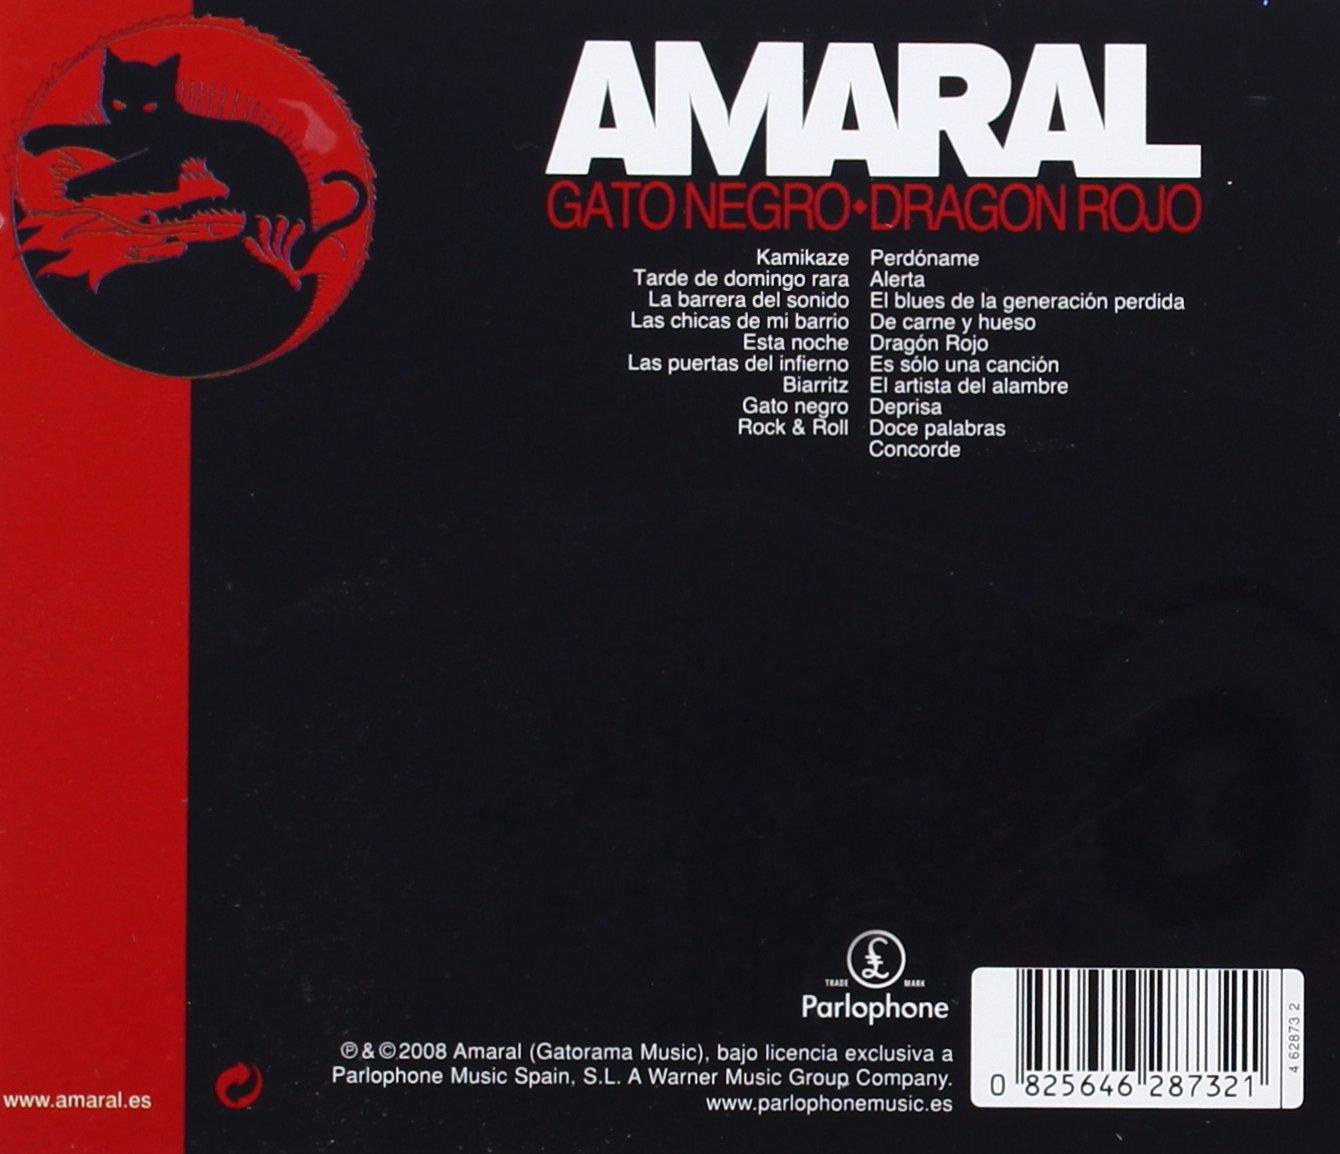 - Gato Negro Dragon Rojo - Amazon.com Music